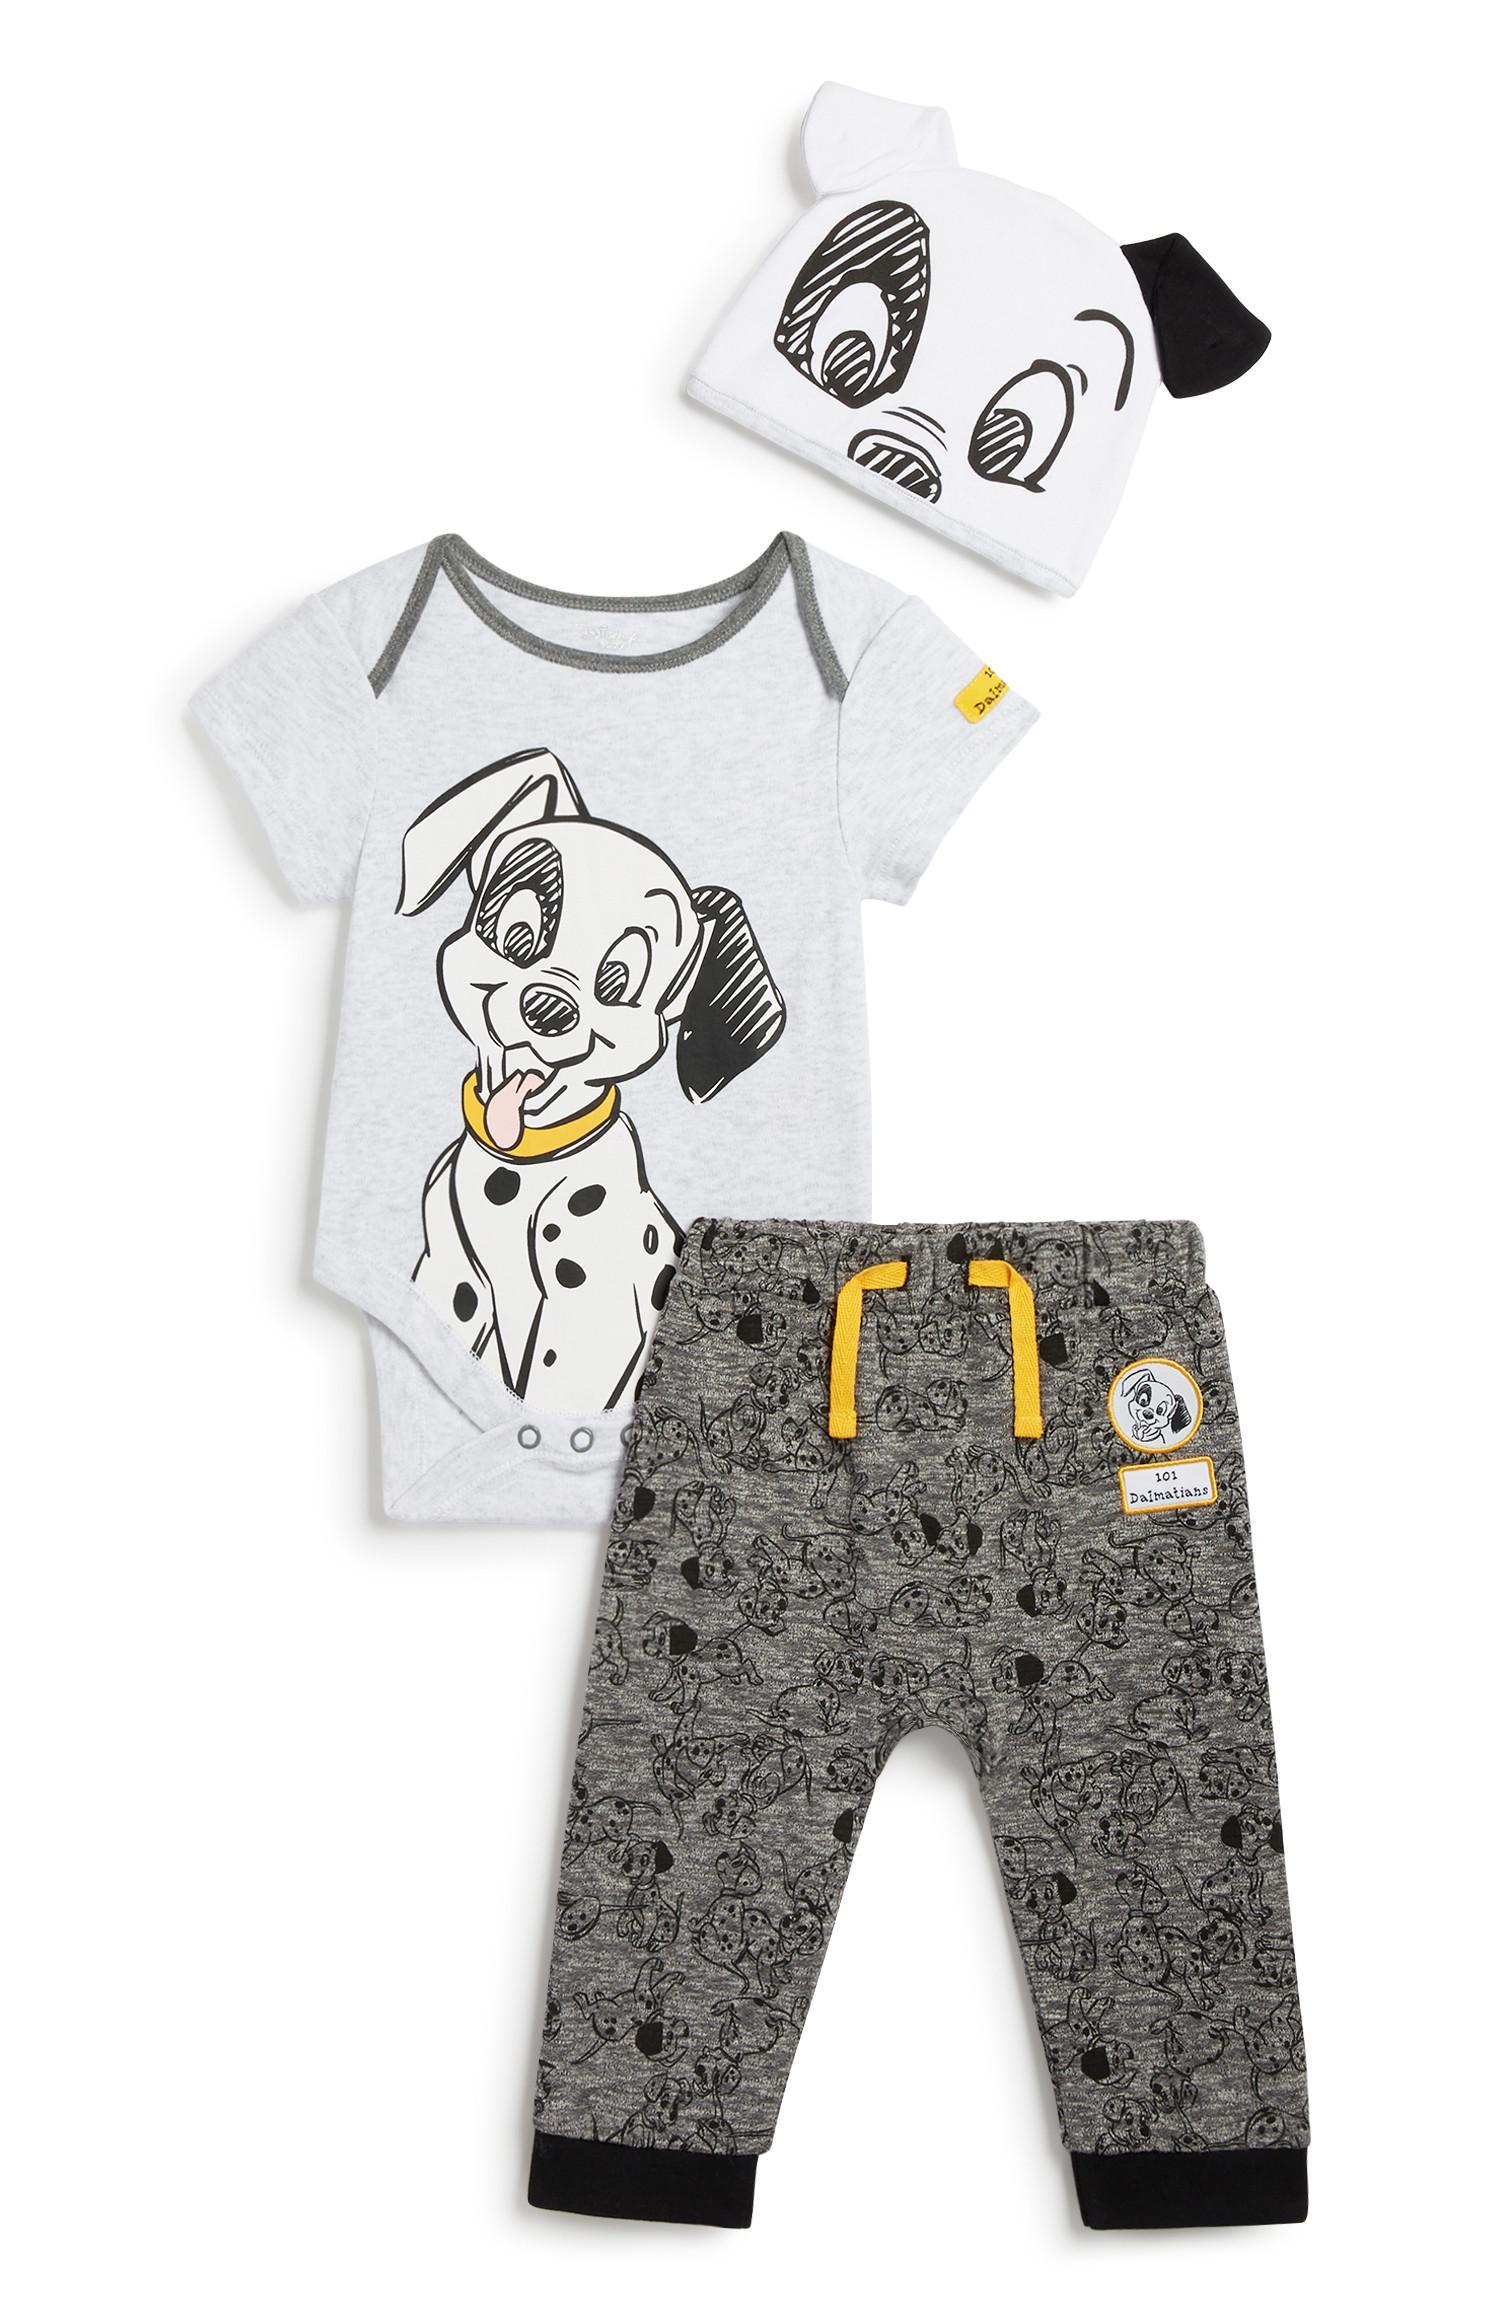 c3ebf753350e 101 Dalmatians 3Pc Outfit Set | Baby Basics | Kids | Categories ...